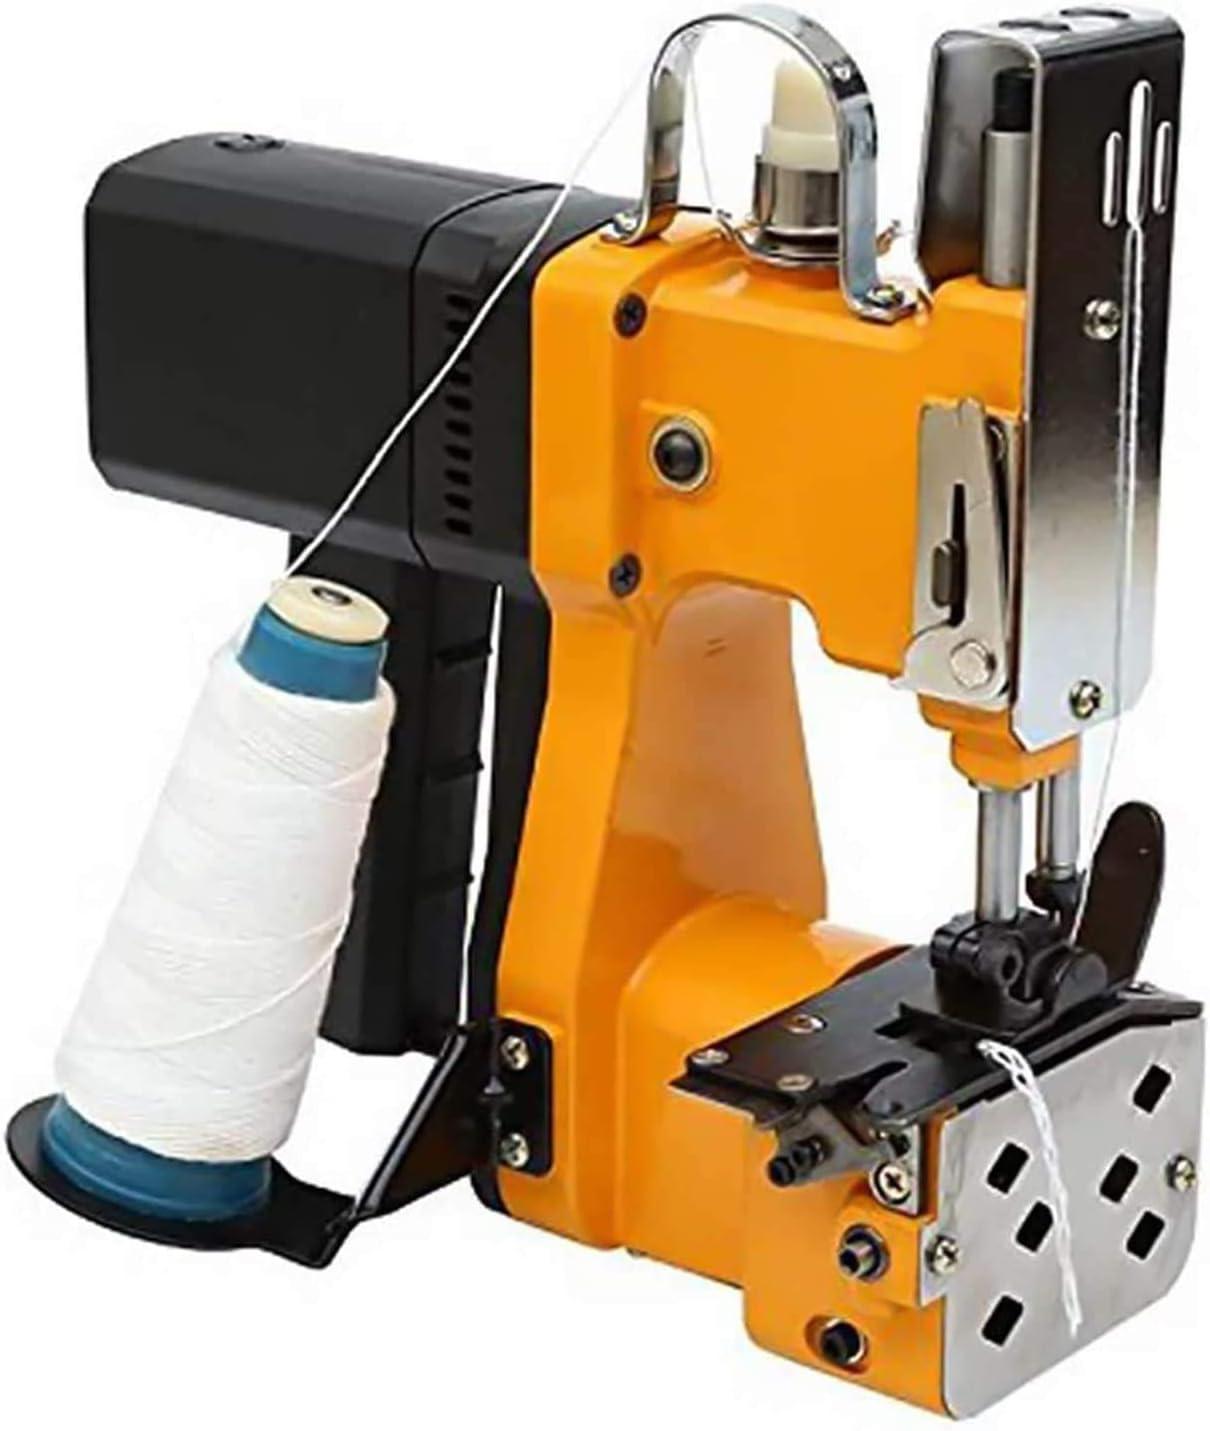 MATHOWAL Máquina de cierre de bolsas, 220V Portátil Máquina de Coser Empaquetadora Eléctrica Sellado de Costura para Bolsa de Plástico Sacos Bolsas de Lona Bolsas Tejidas Paquetes de Bolsas